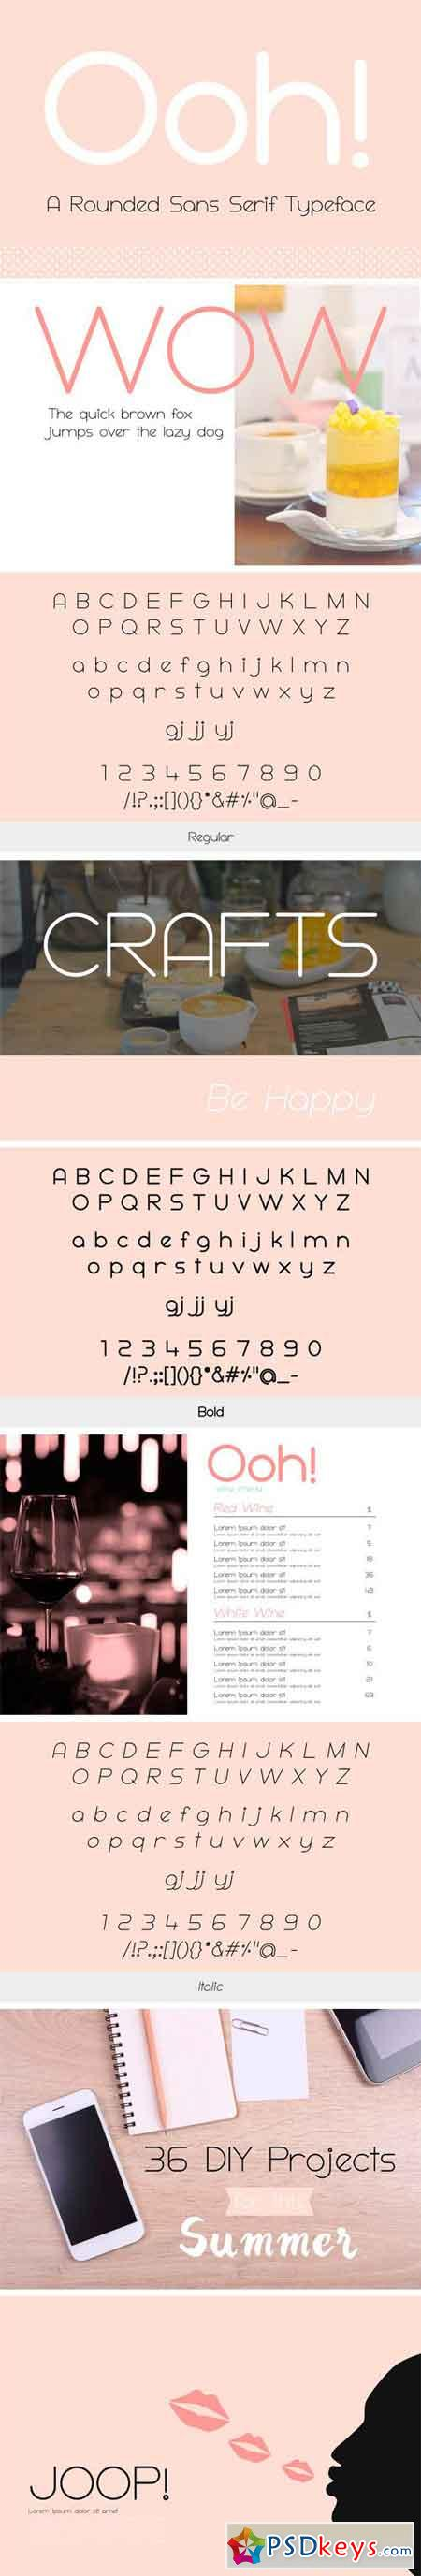 Ooh! Rounded Sans Serif Typeface 1603313